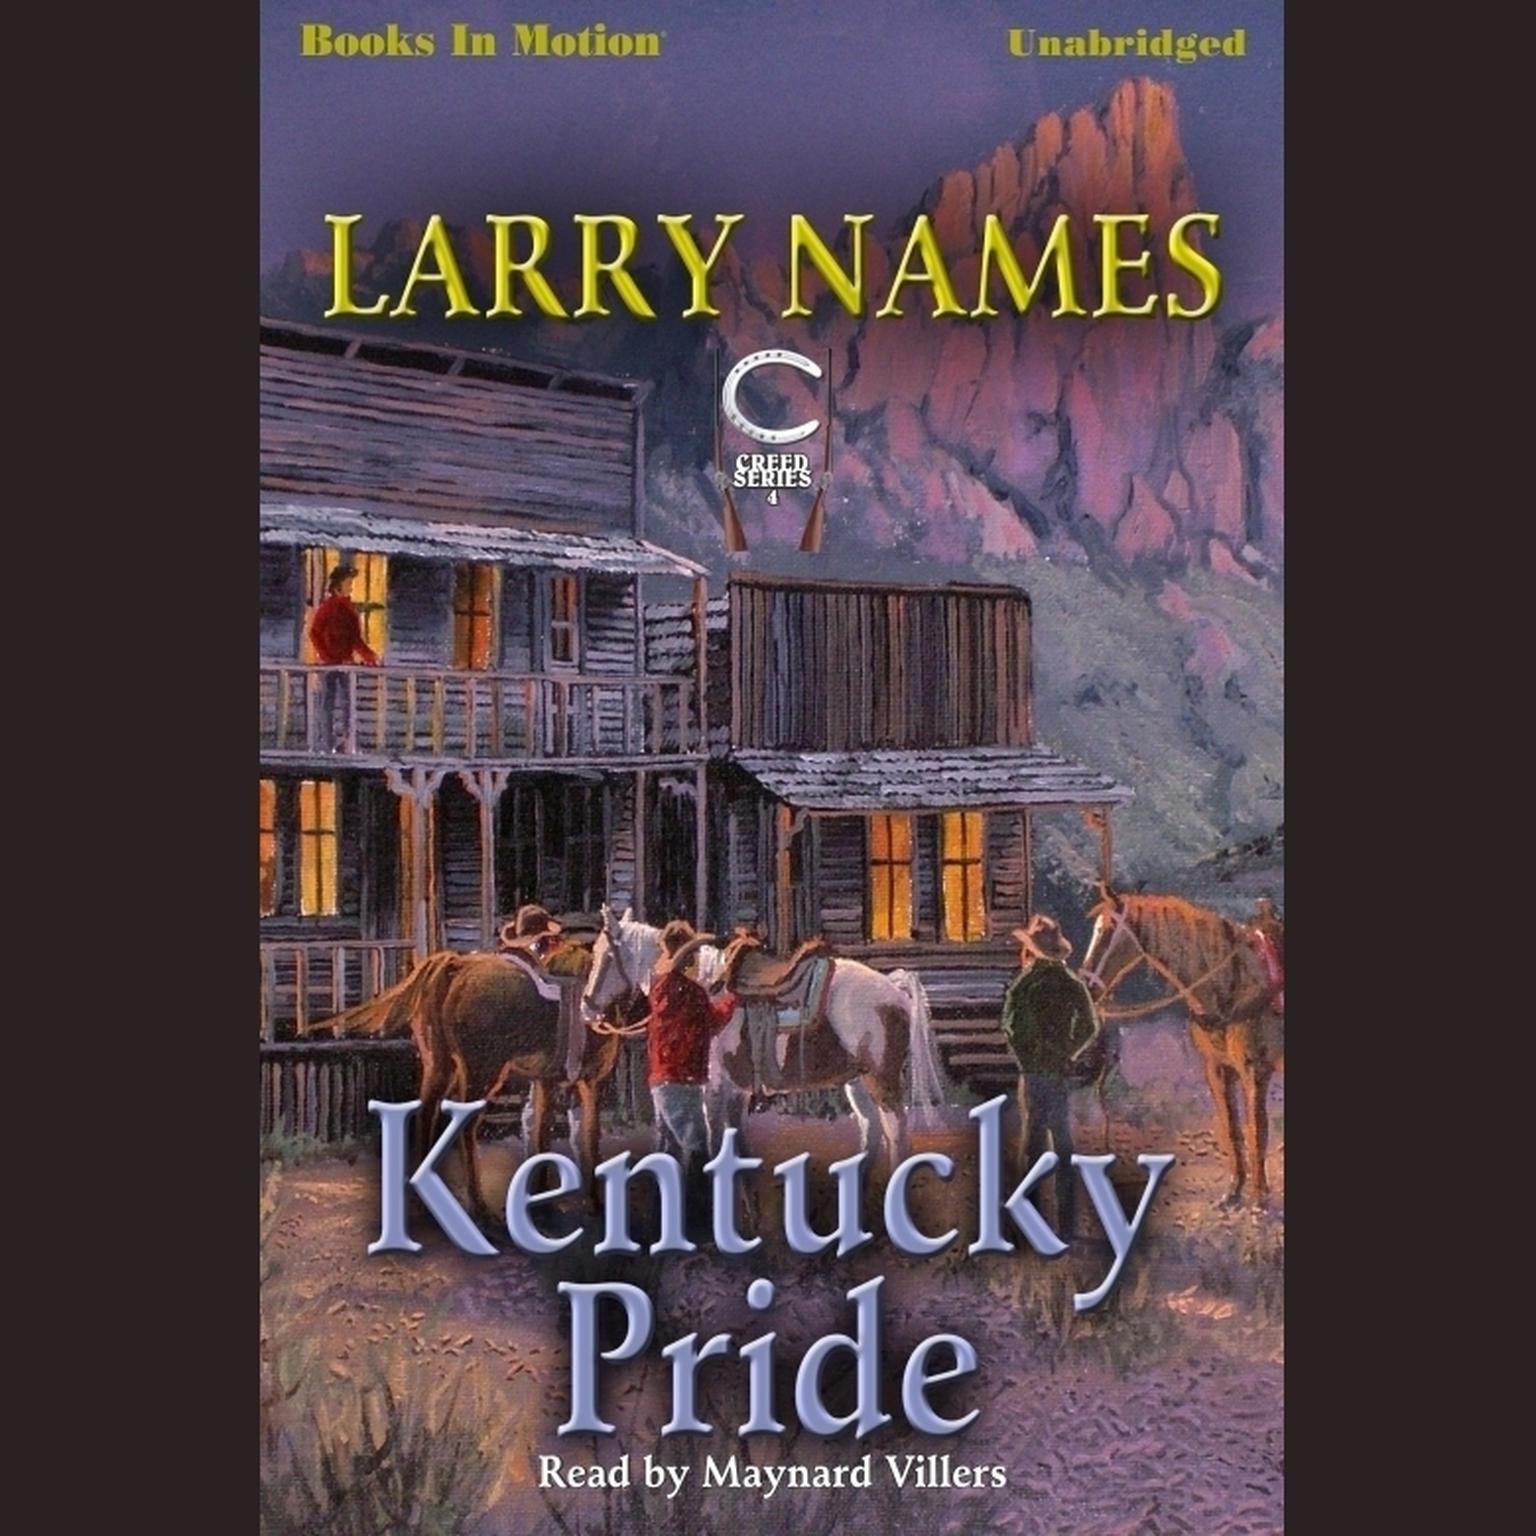 Kentucky Pride Audiobook, by Larry Names